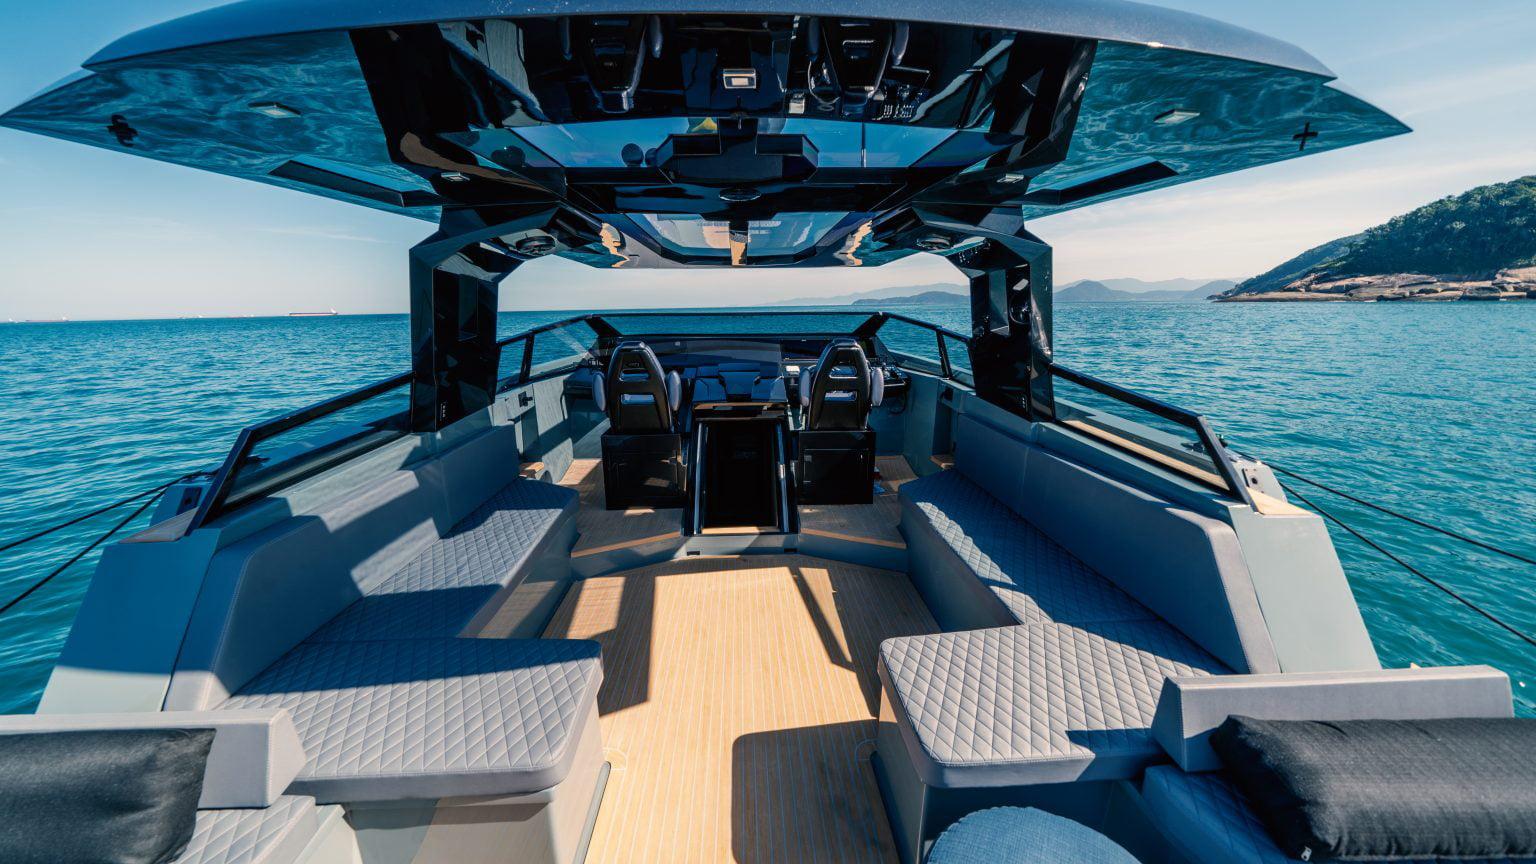 Okean 55 sport-ht - exteriores (16)